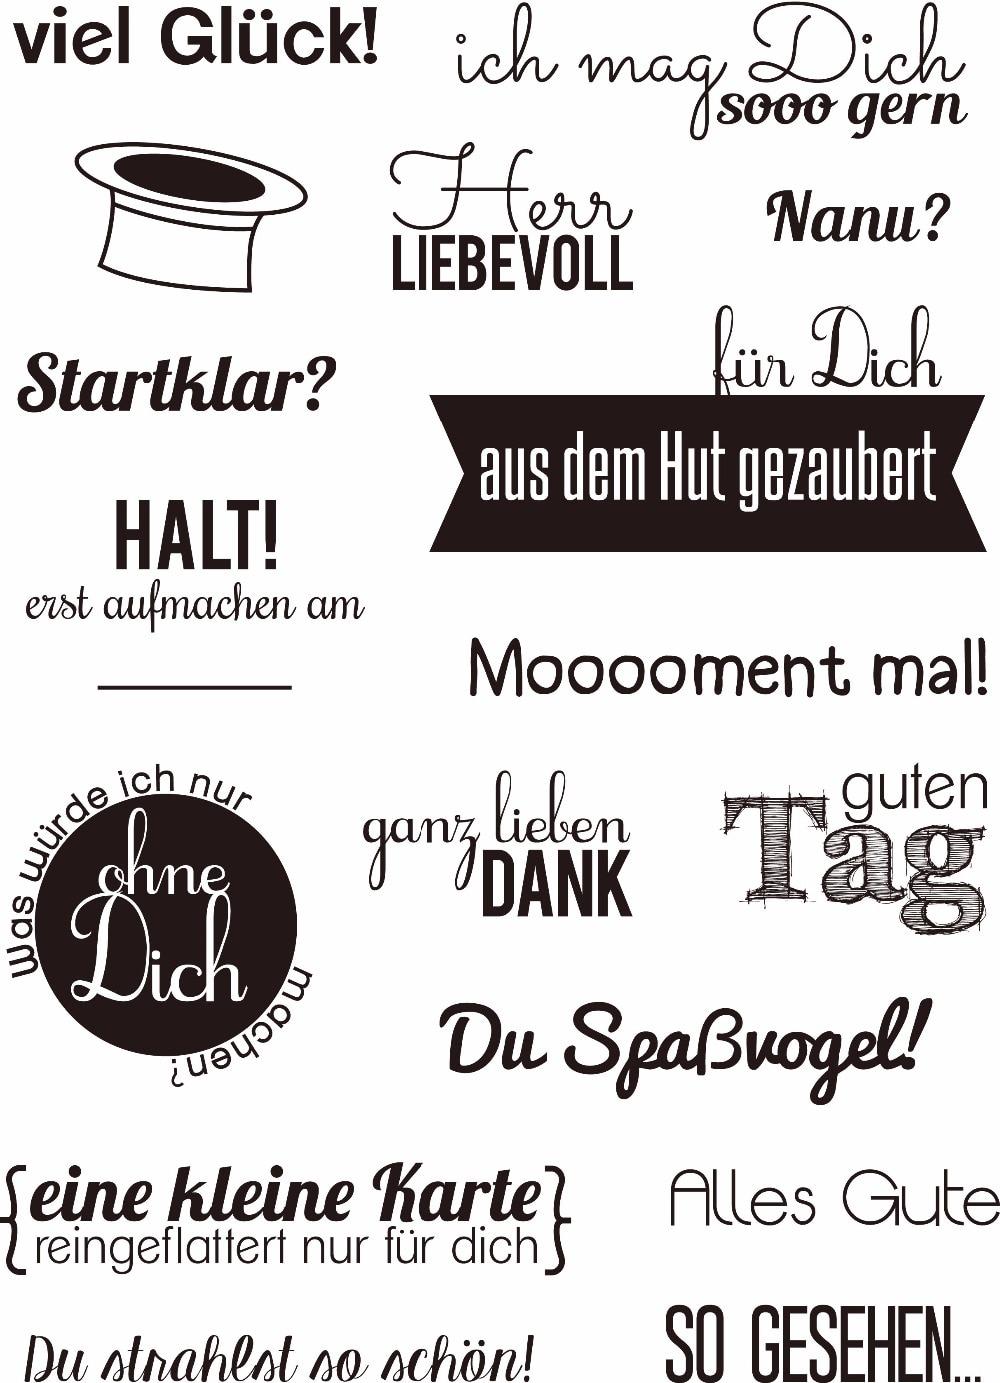 Deutsch wort Transparent Klar Silikon Stempel/Dichtung für DIY scrapbooking/fotoalbum Dekorative klare stempel A142